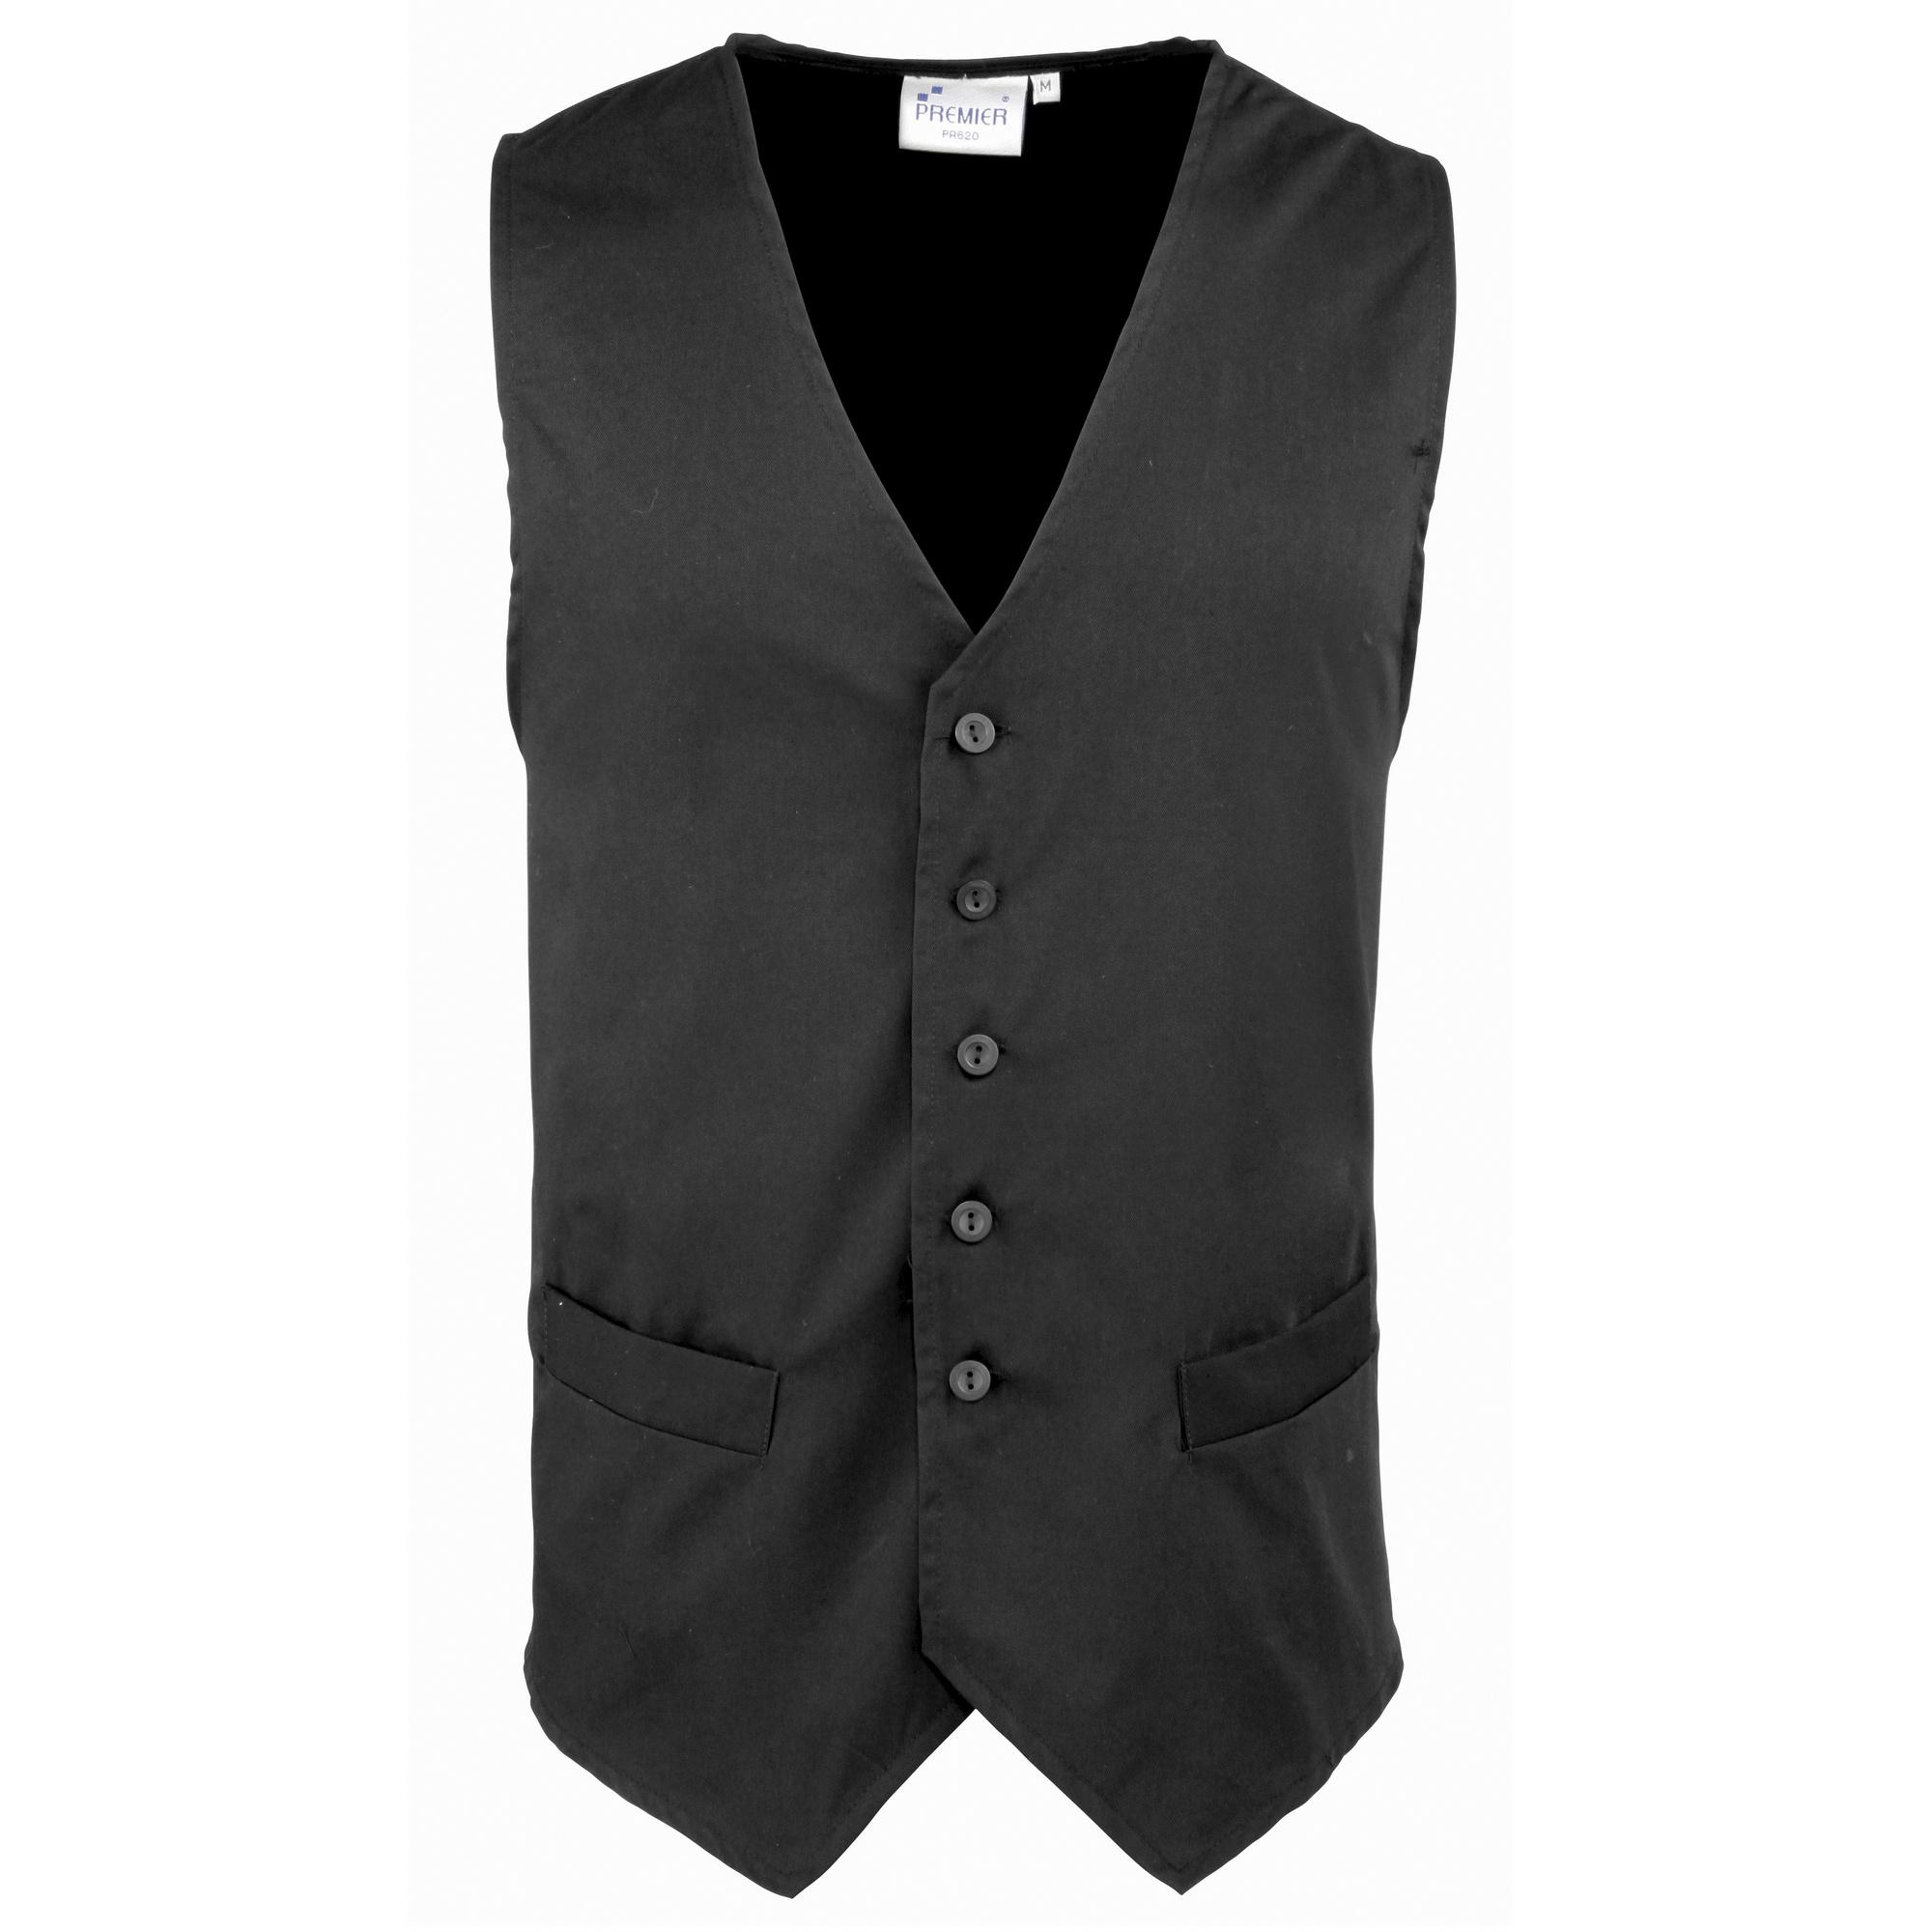 Premier Mens Hospitality / Bar / Catering Waistcoat  (Pack of 2) (M) (Black)